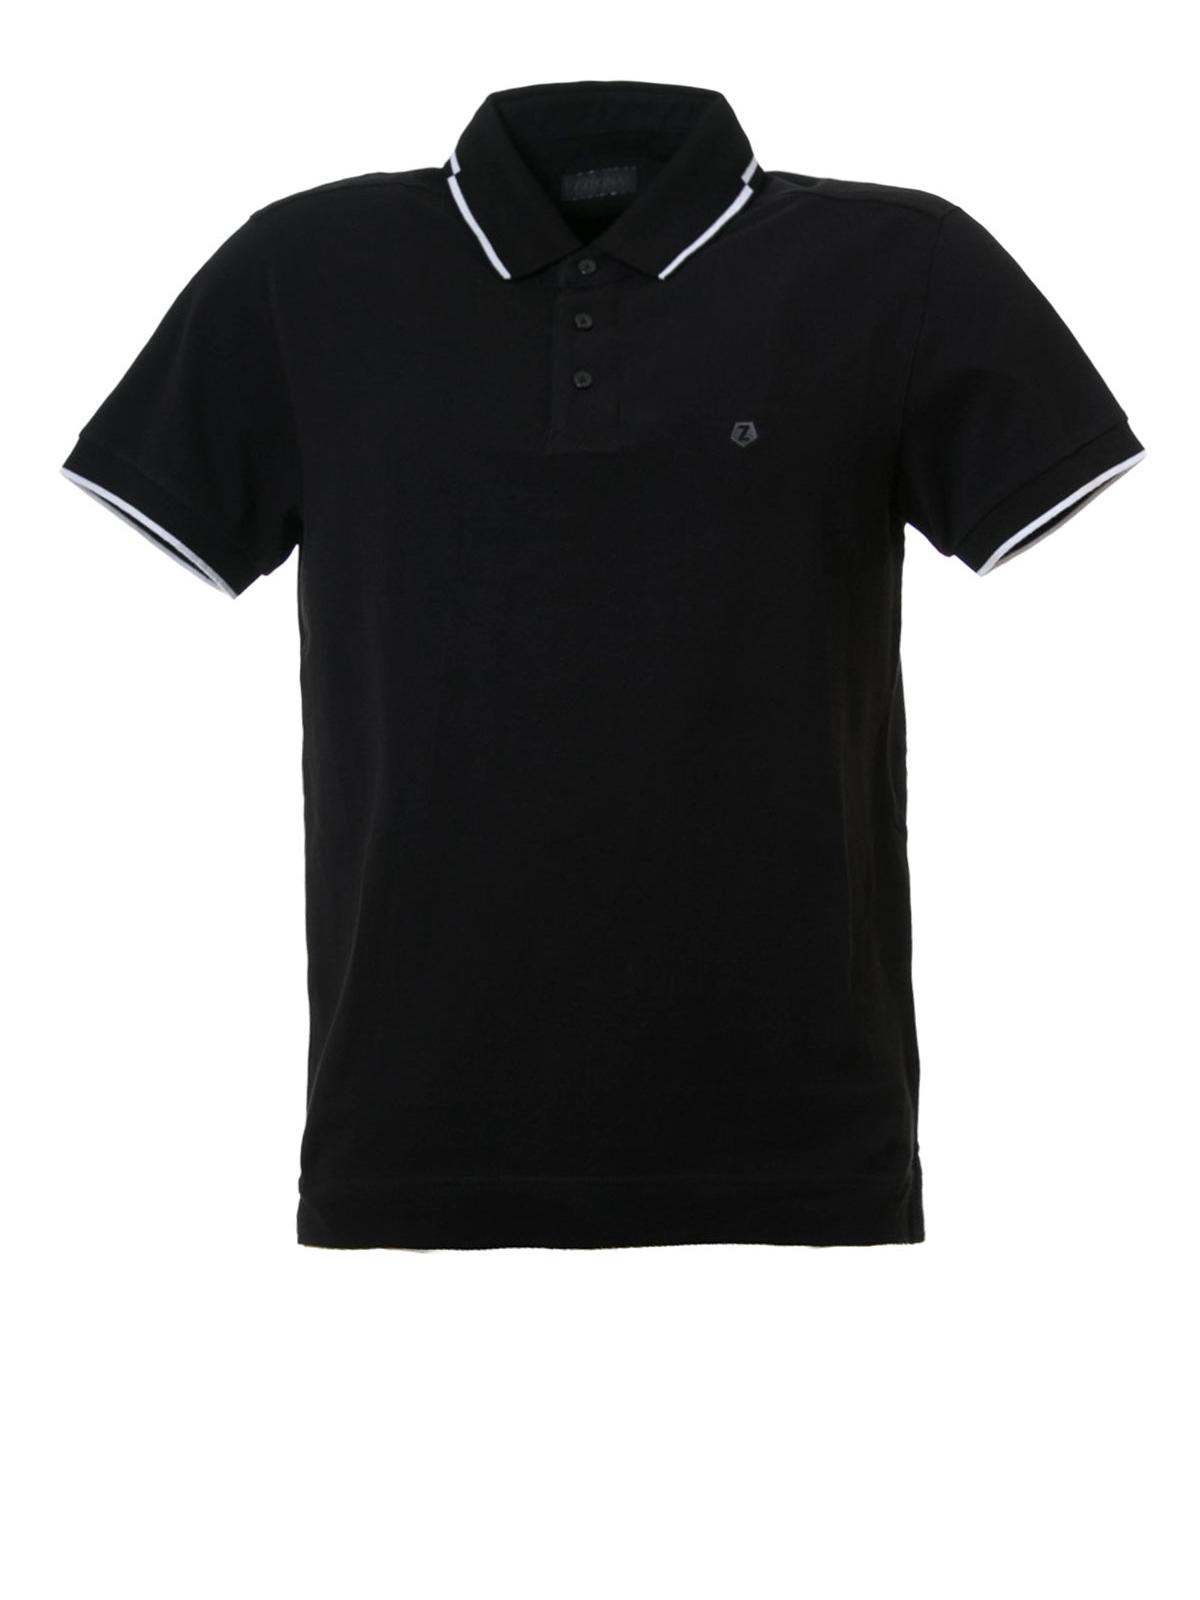 Classic cotton pique polo shirt by z zegna polo shirts for Zegna polo shirts sale